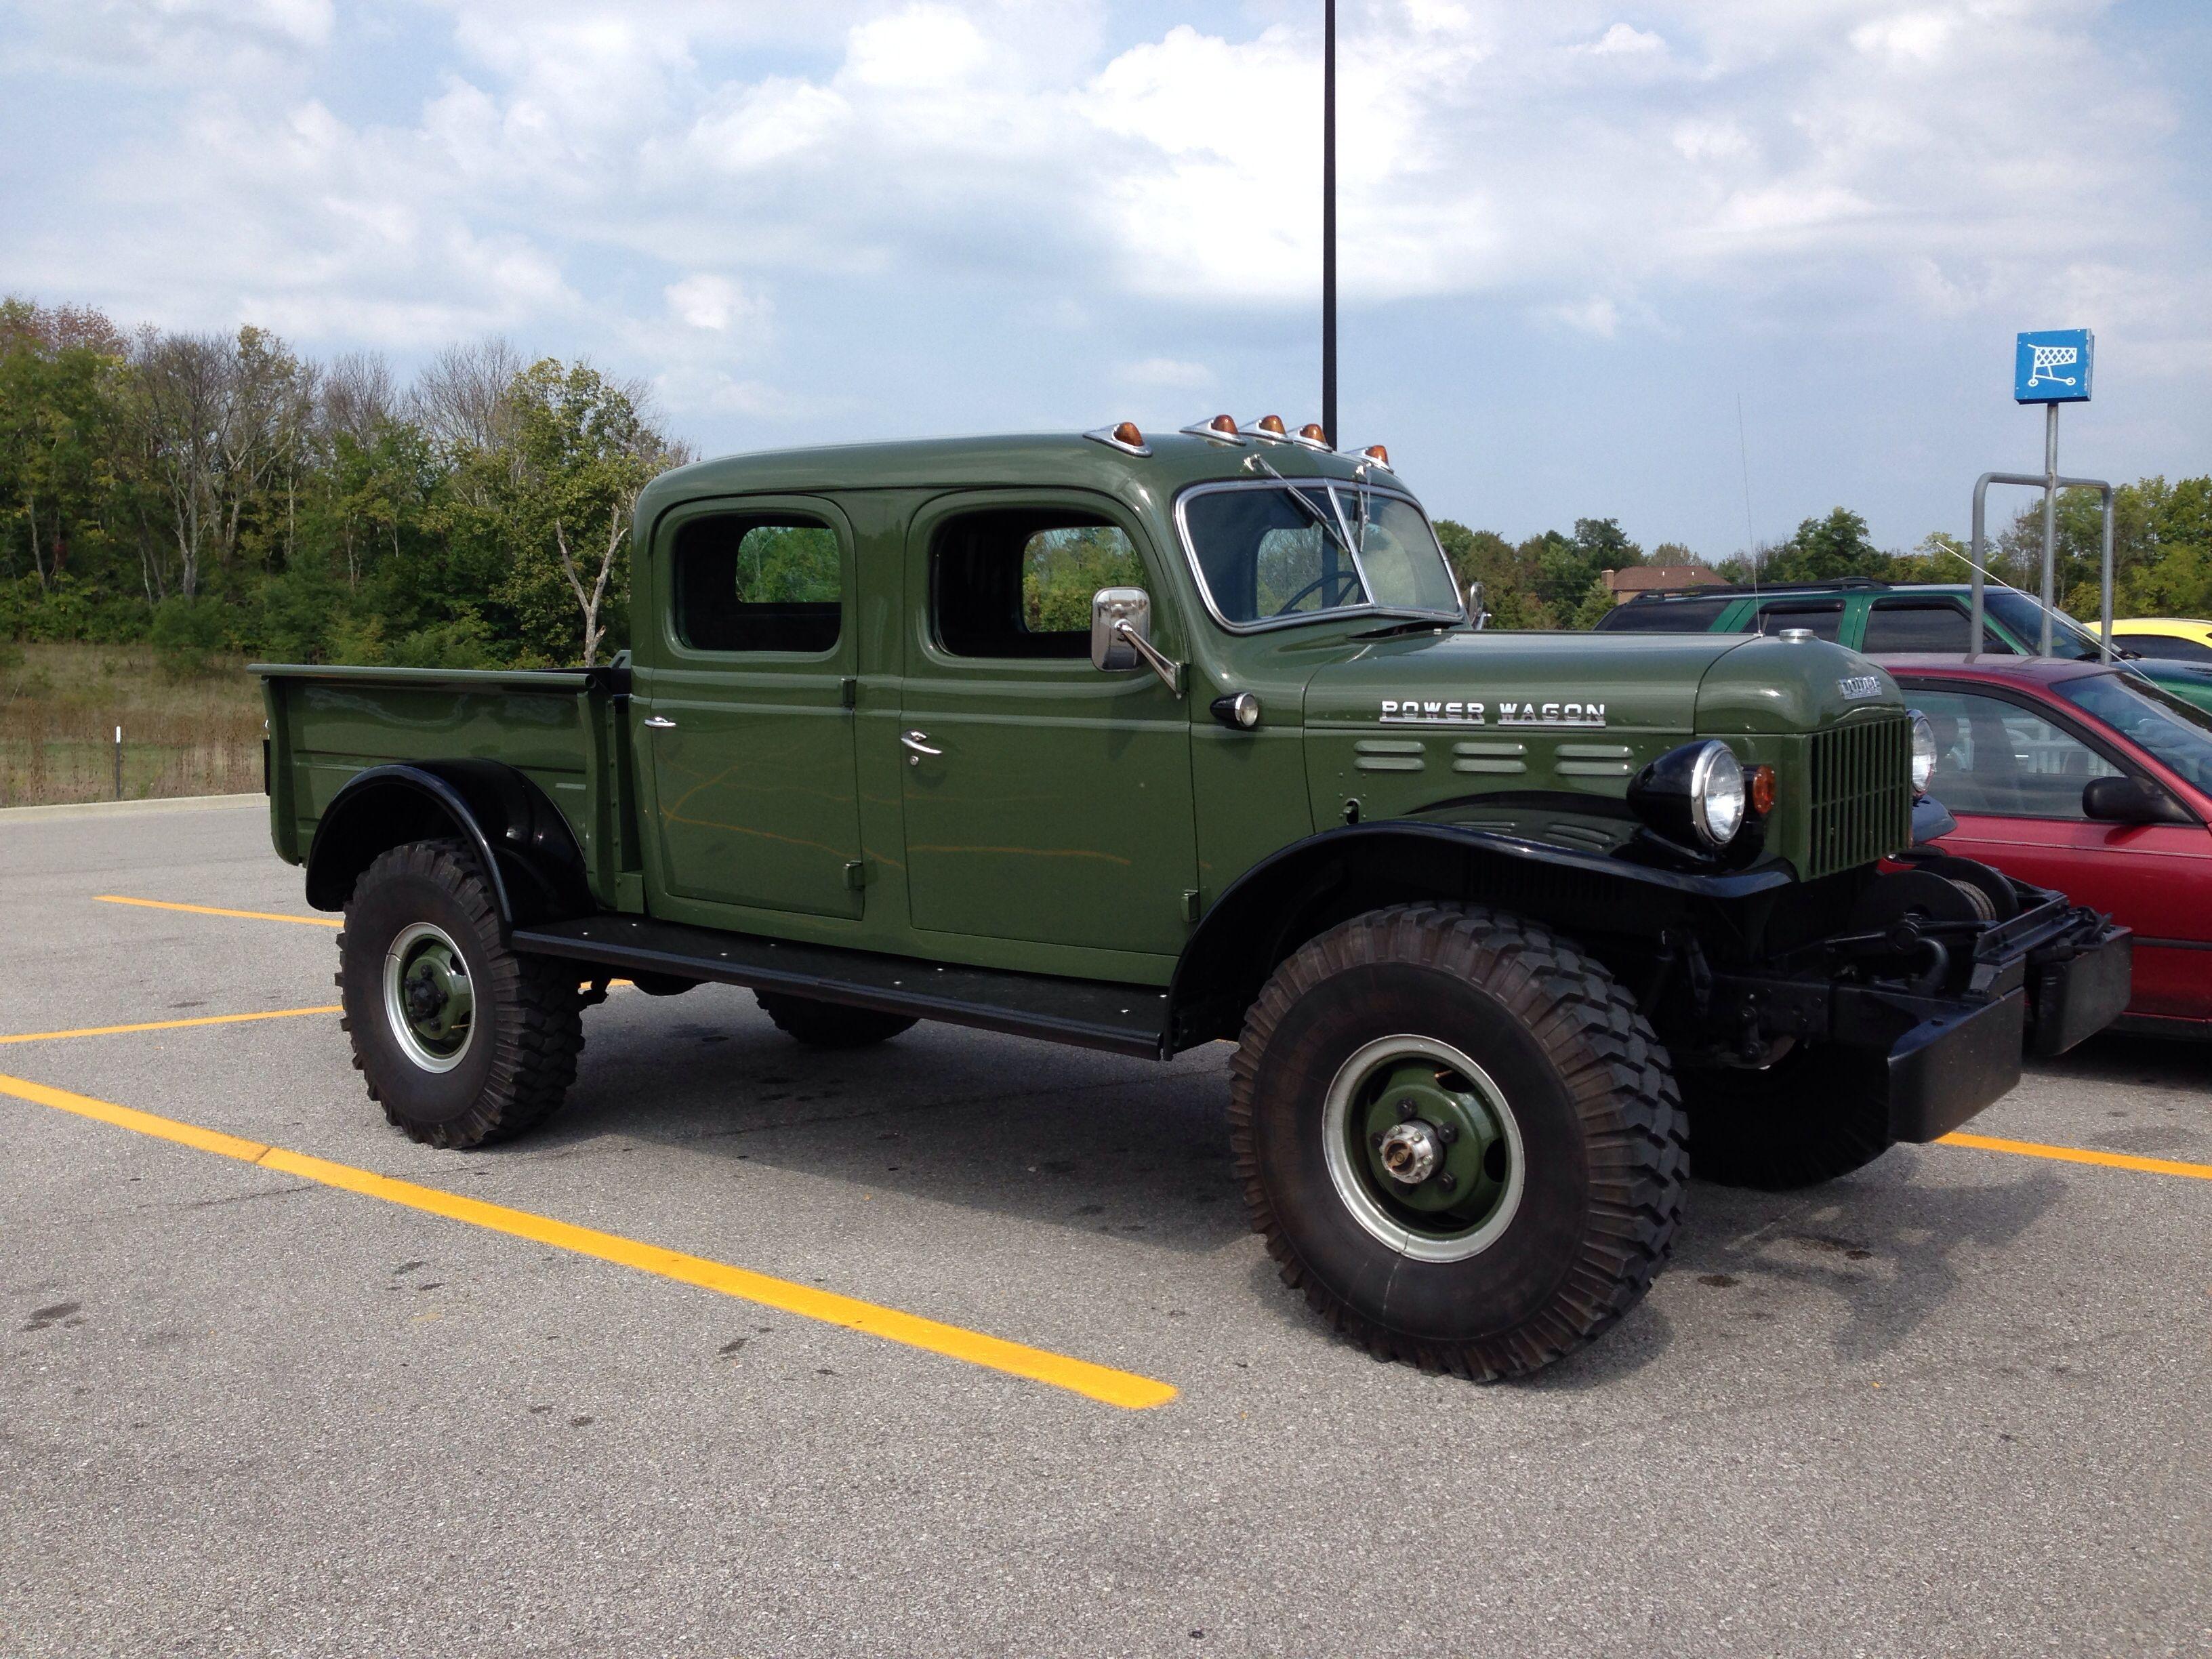 Jeep Fc Crew Cab For Sale >> Power Wagon Crew Cab Truck Craigslist   Autos Post